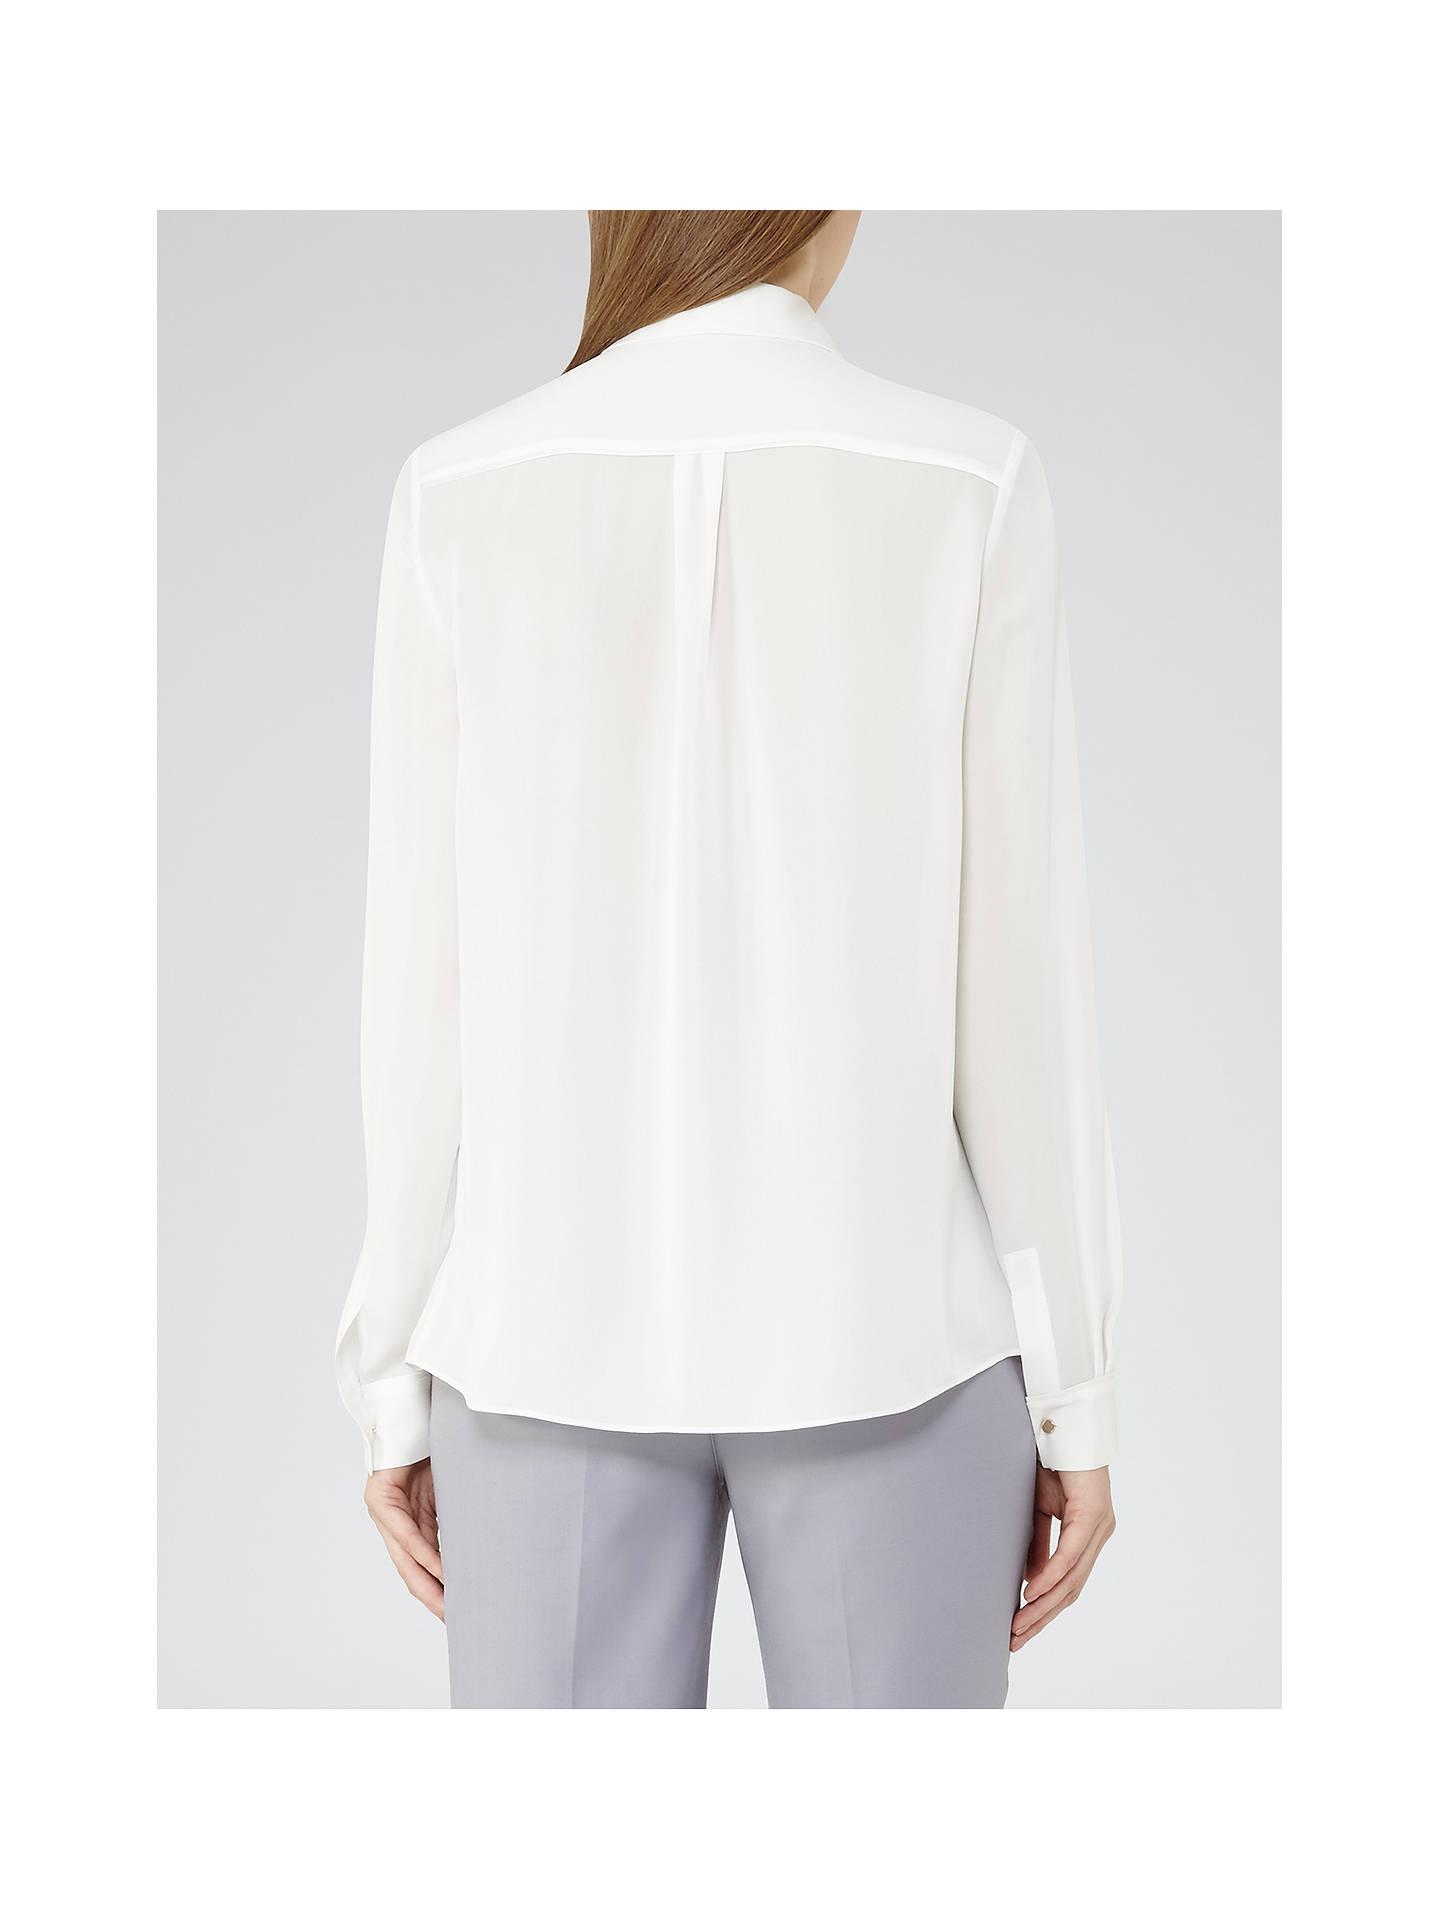 bc4975f3b33462 ... Buy Reiss Fleur Top, Off White, 6 Online at johnlewis.com ...